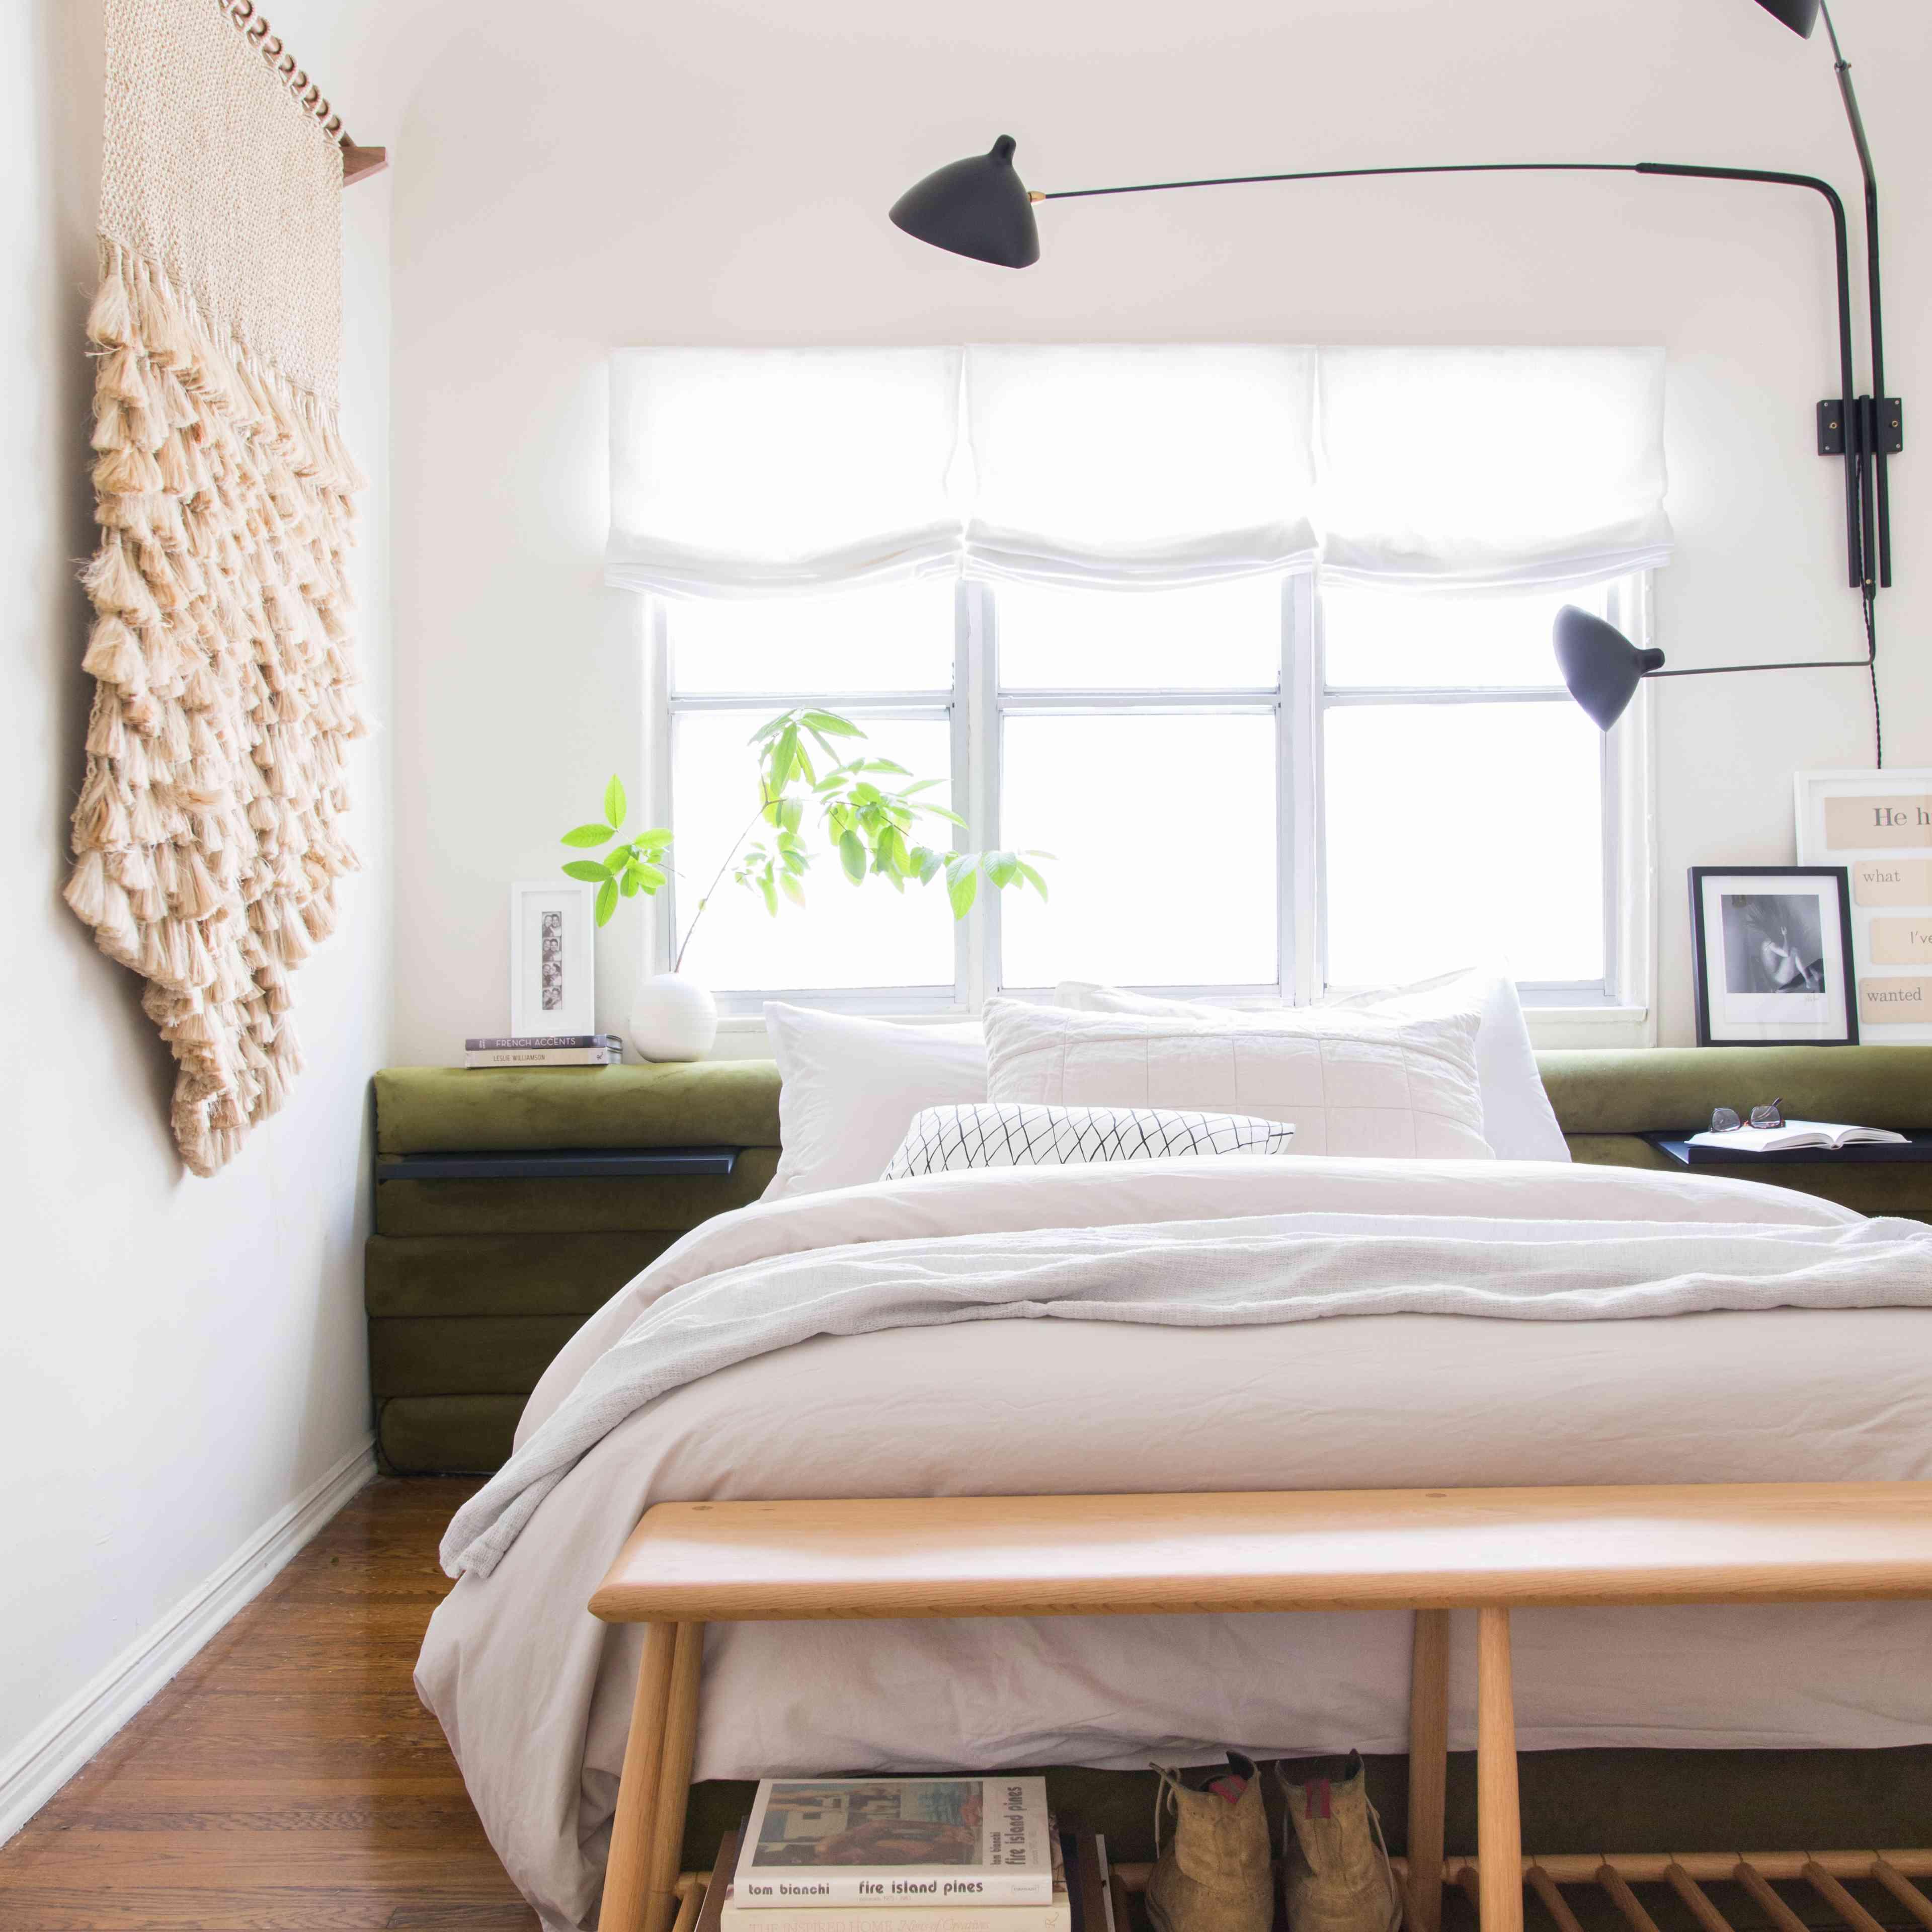 Rental bedroom with DIY bedframe